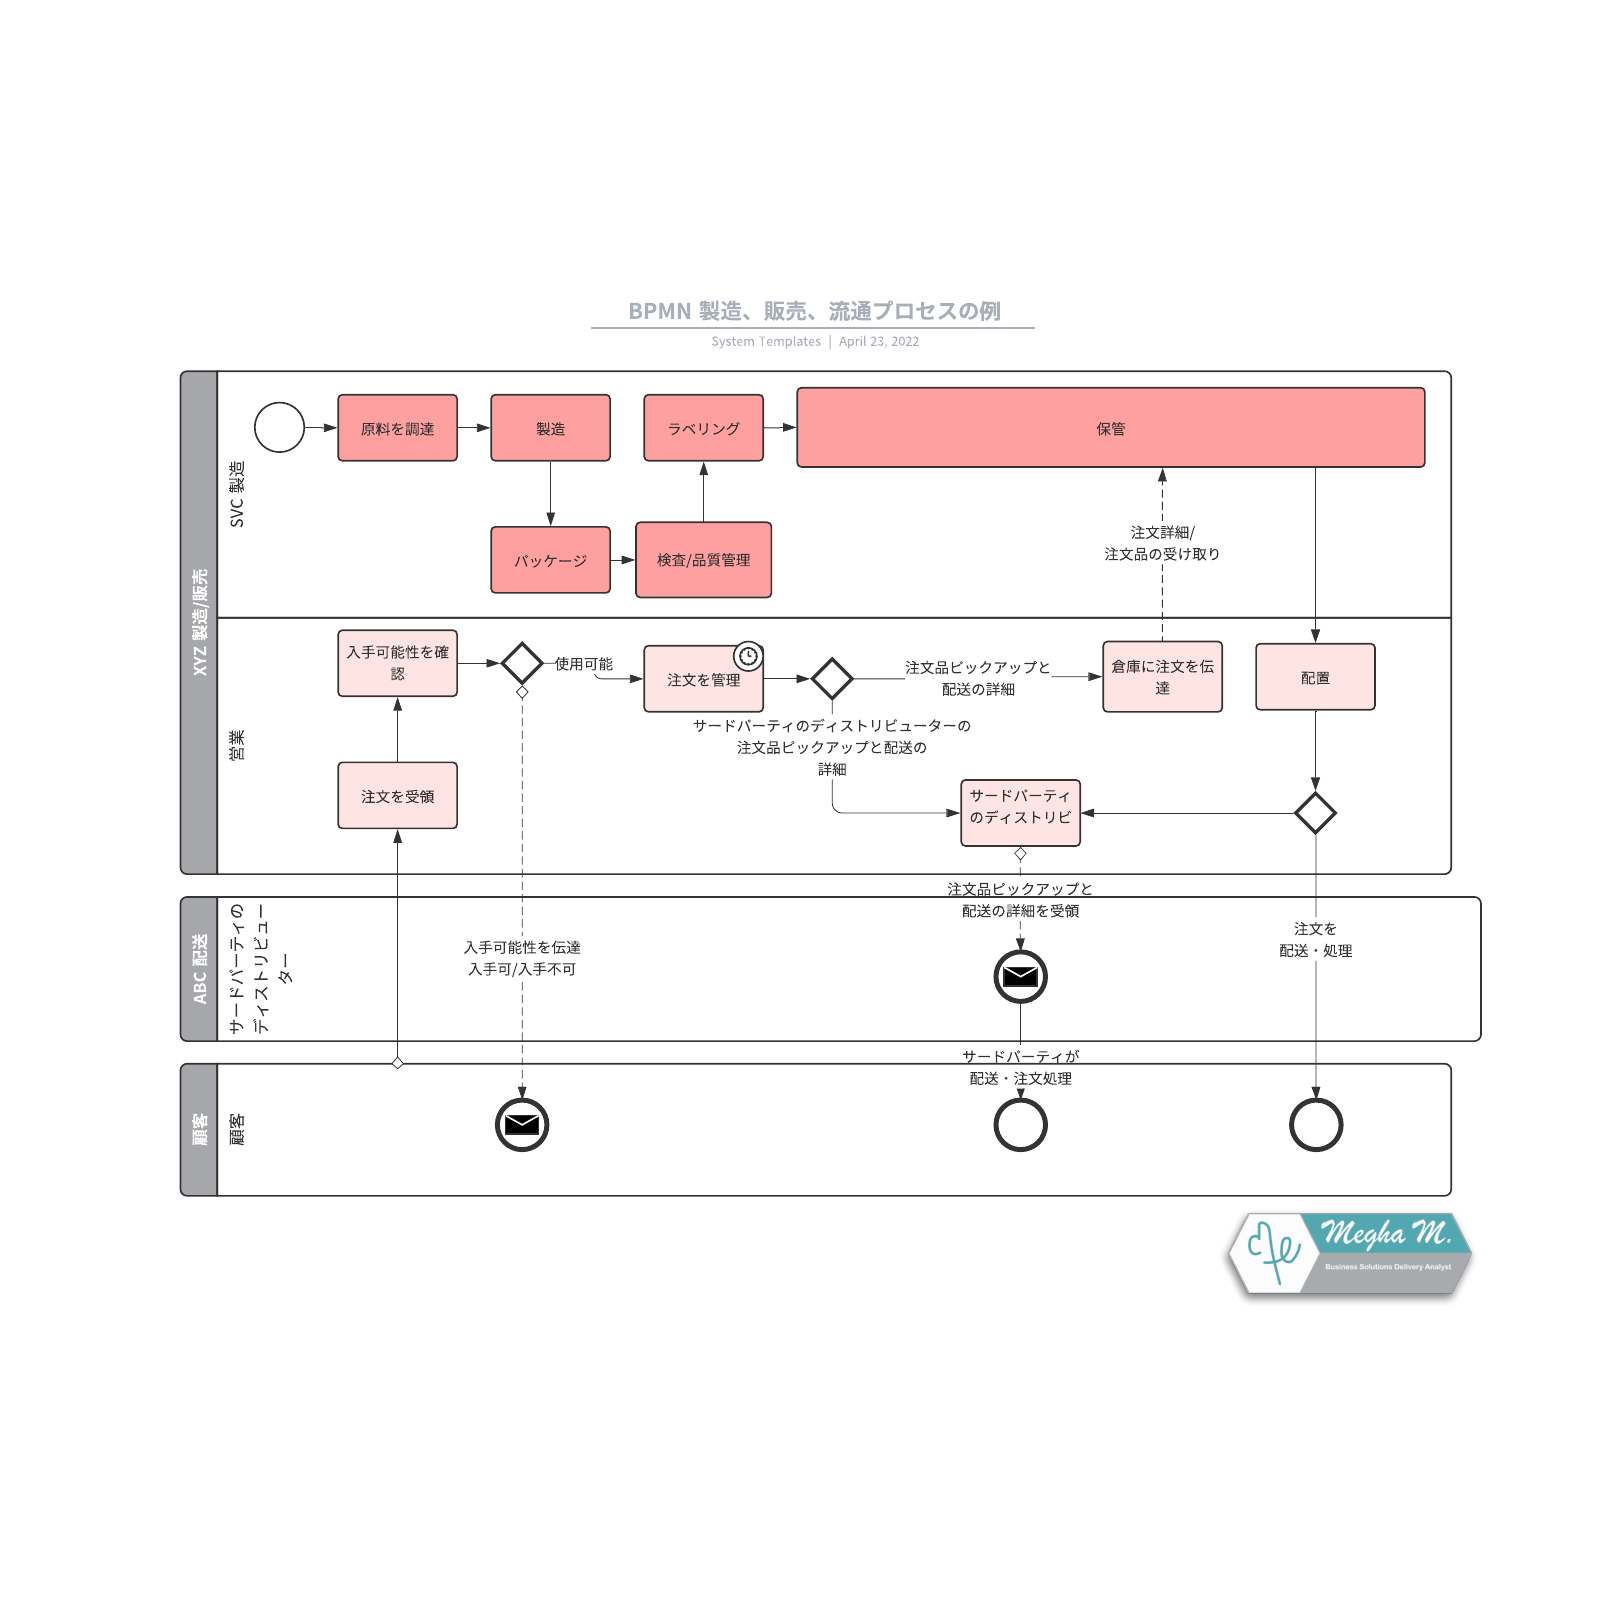 BPMN業務プロセスモデル図入門テンプレート